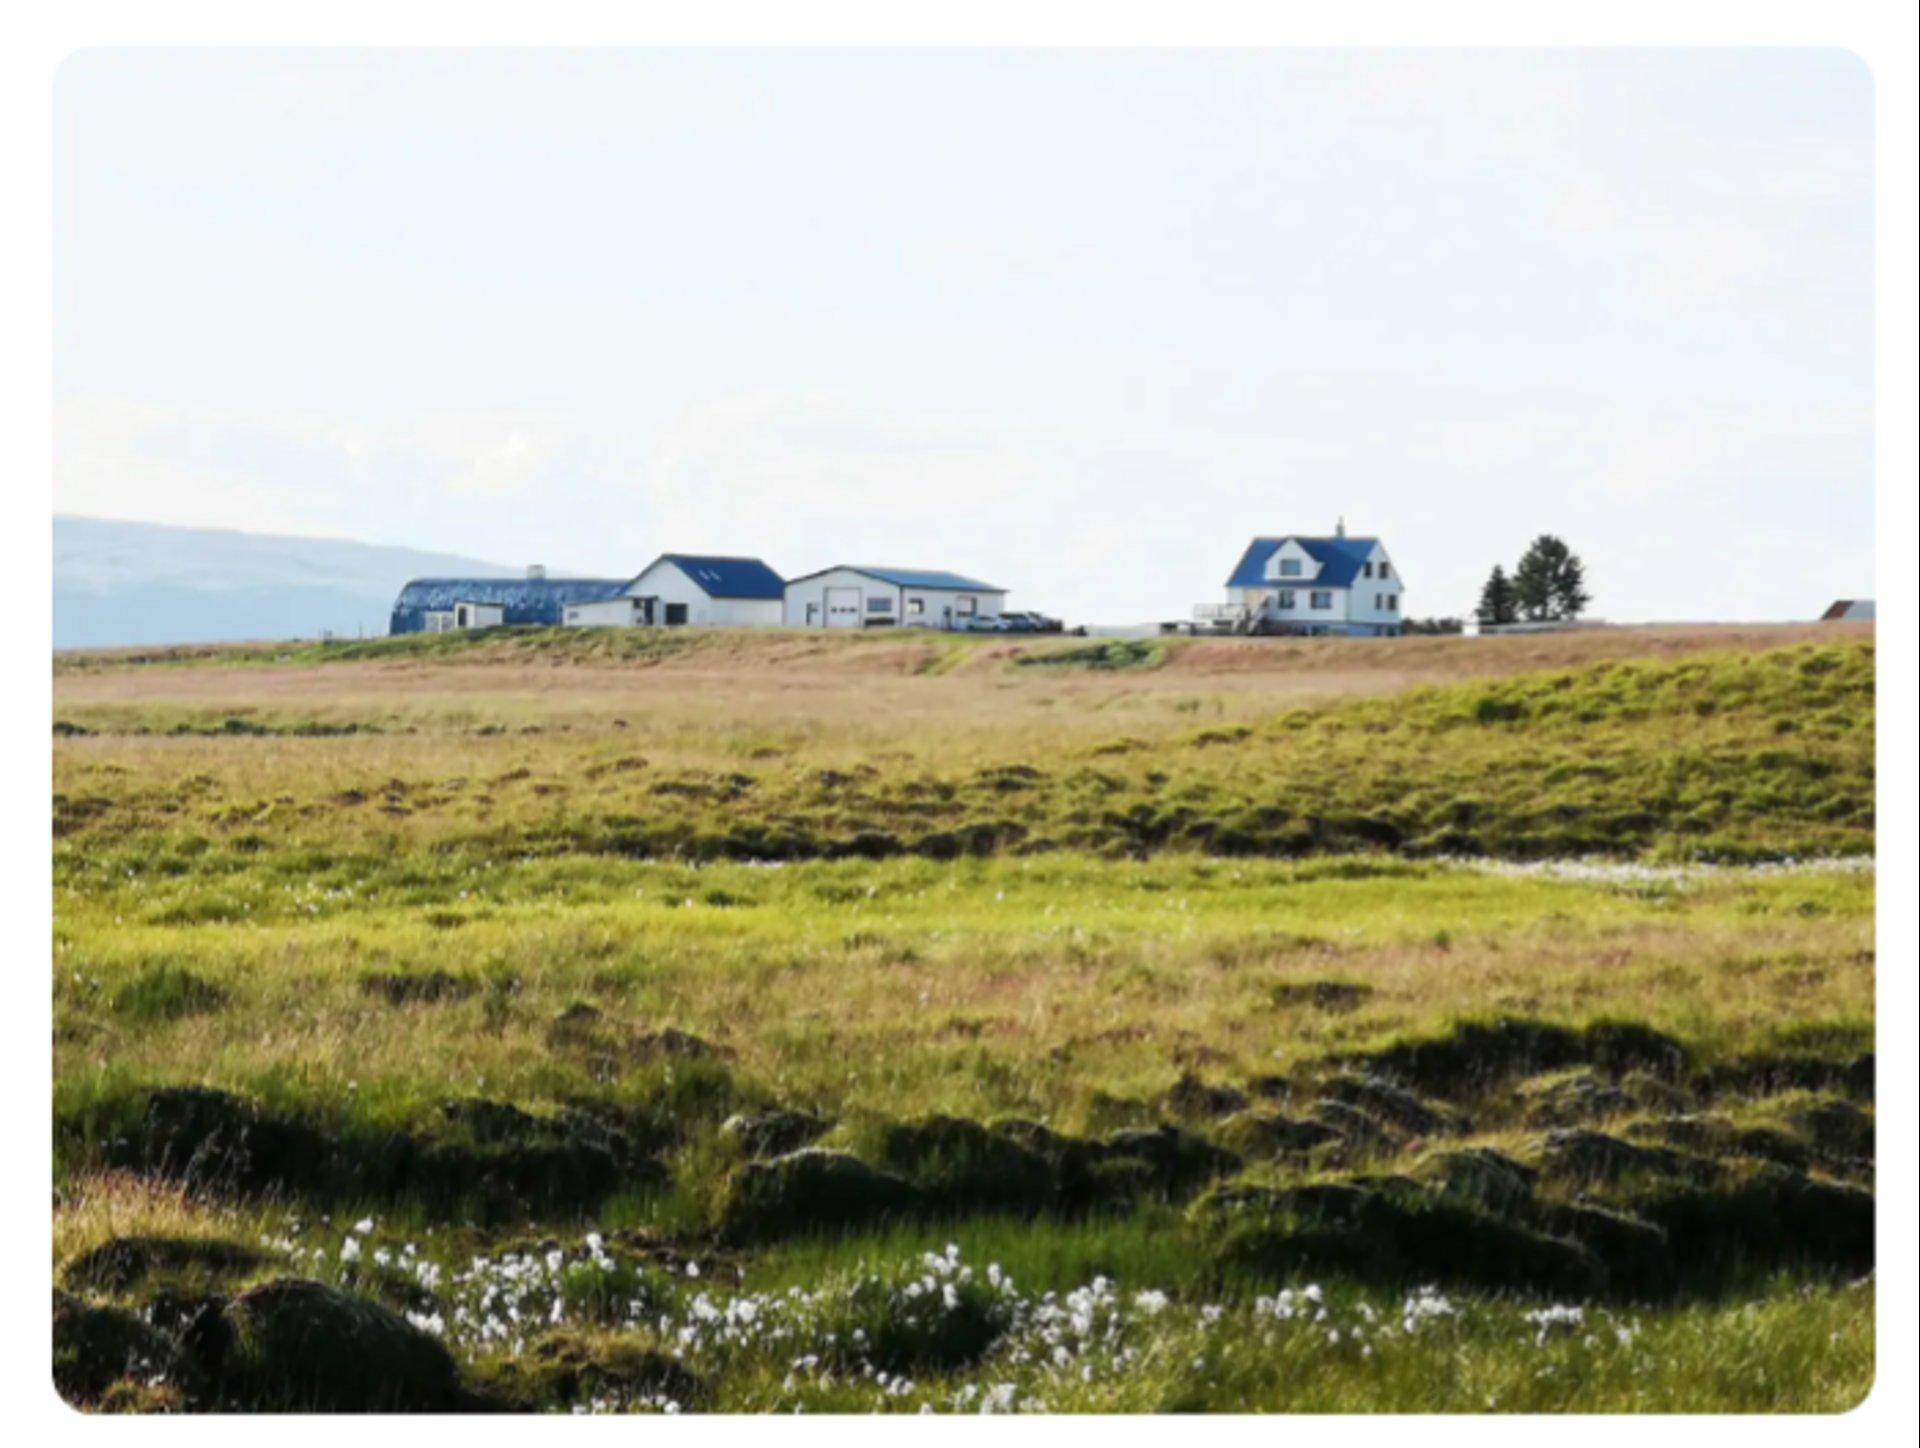 75 days round the world - P1 Iceland  Thumbnail